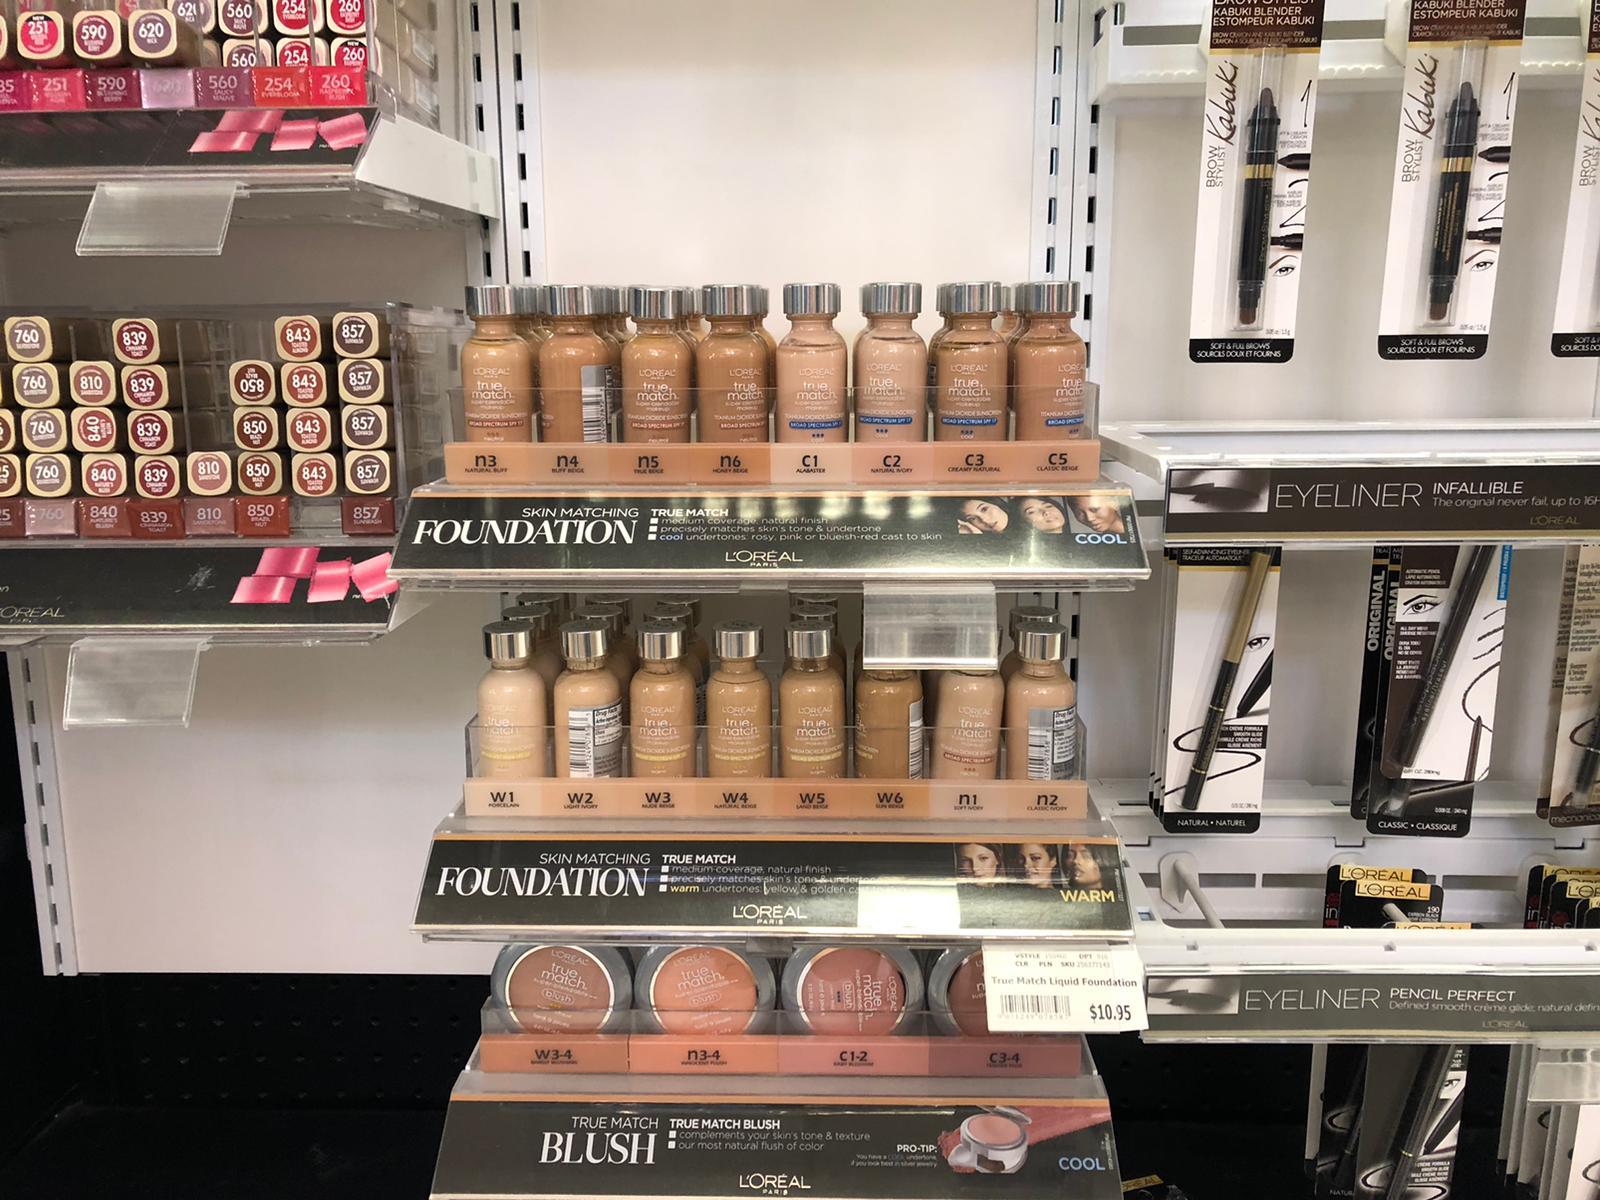 Barnes & Noble's Makeup Section Lacks Options for Darker Tones - PantherNOW